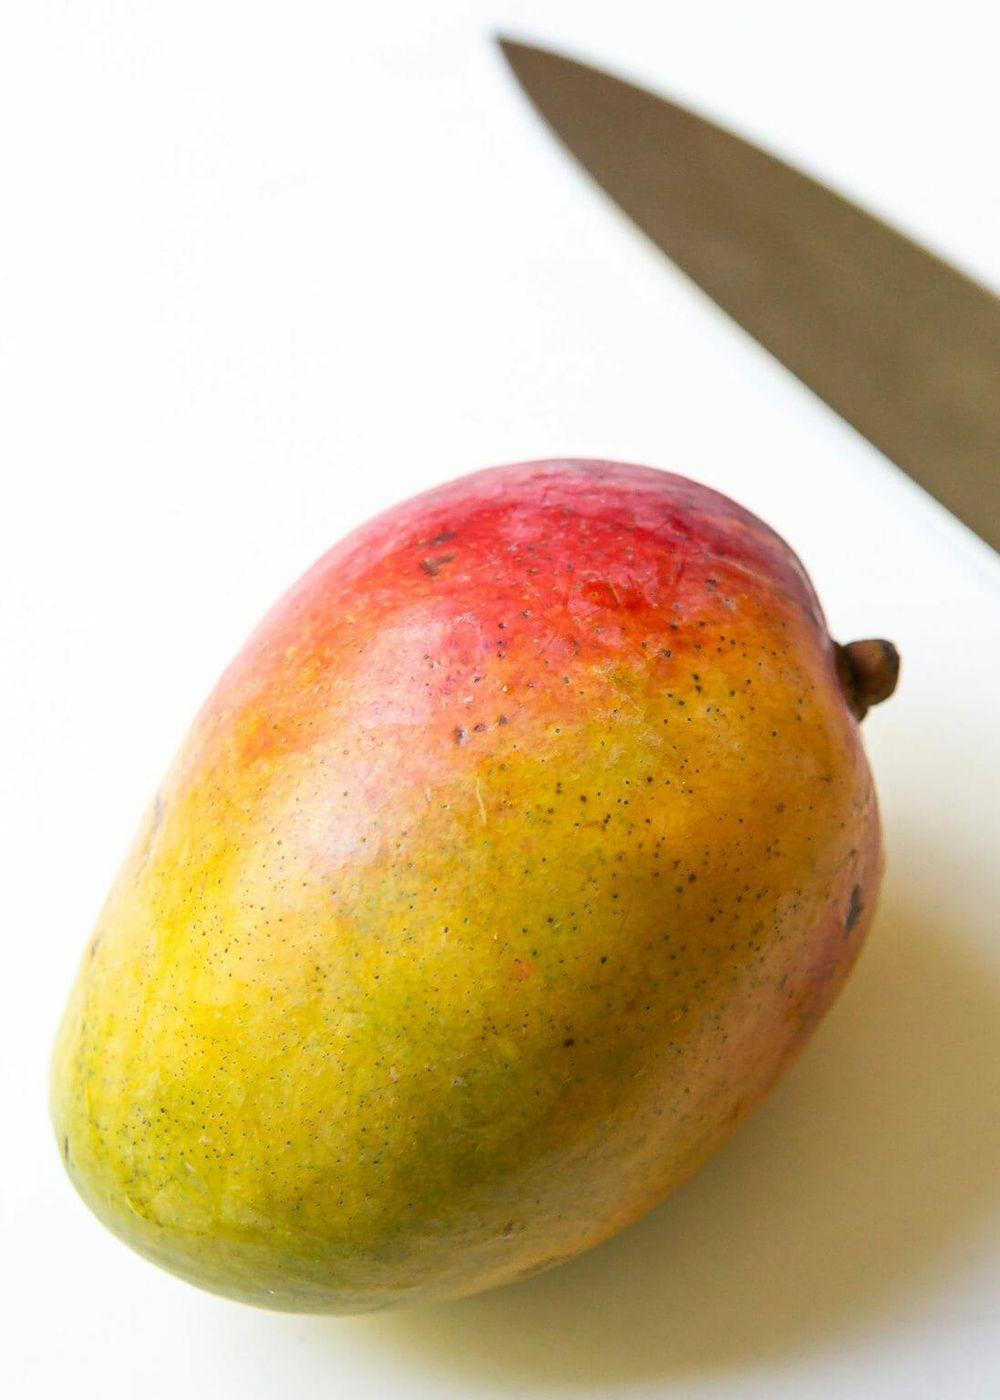 Mango - image 2 - student project